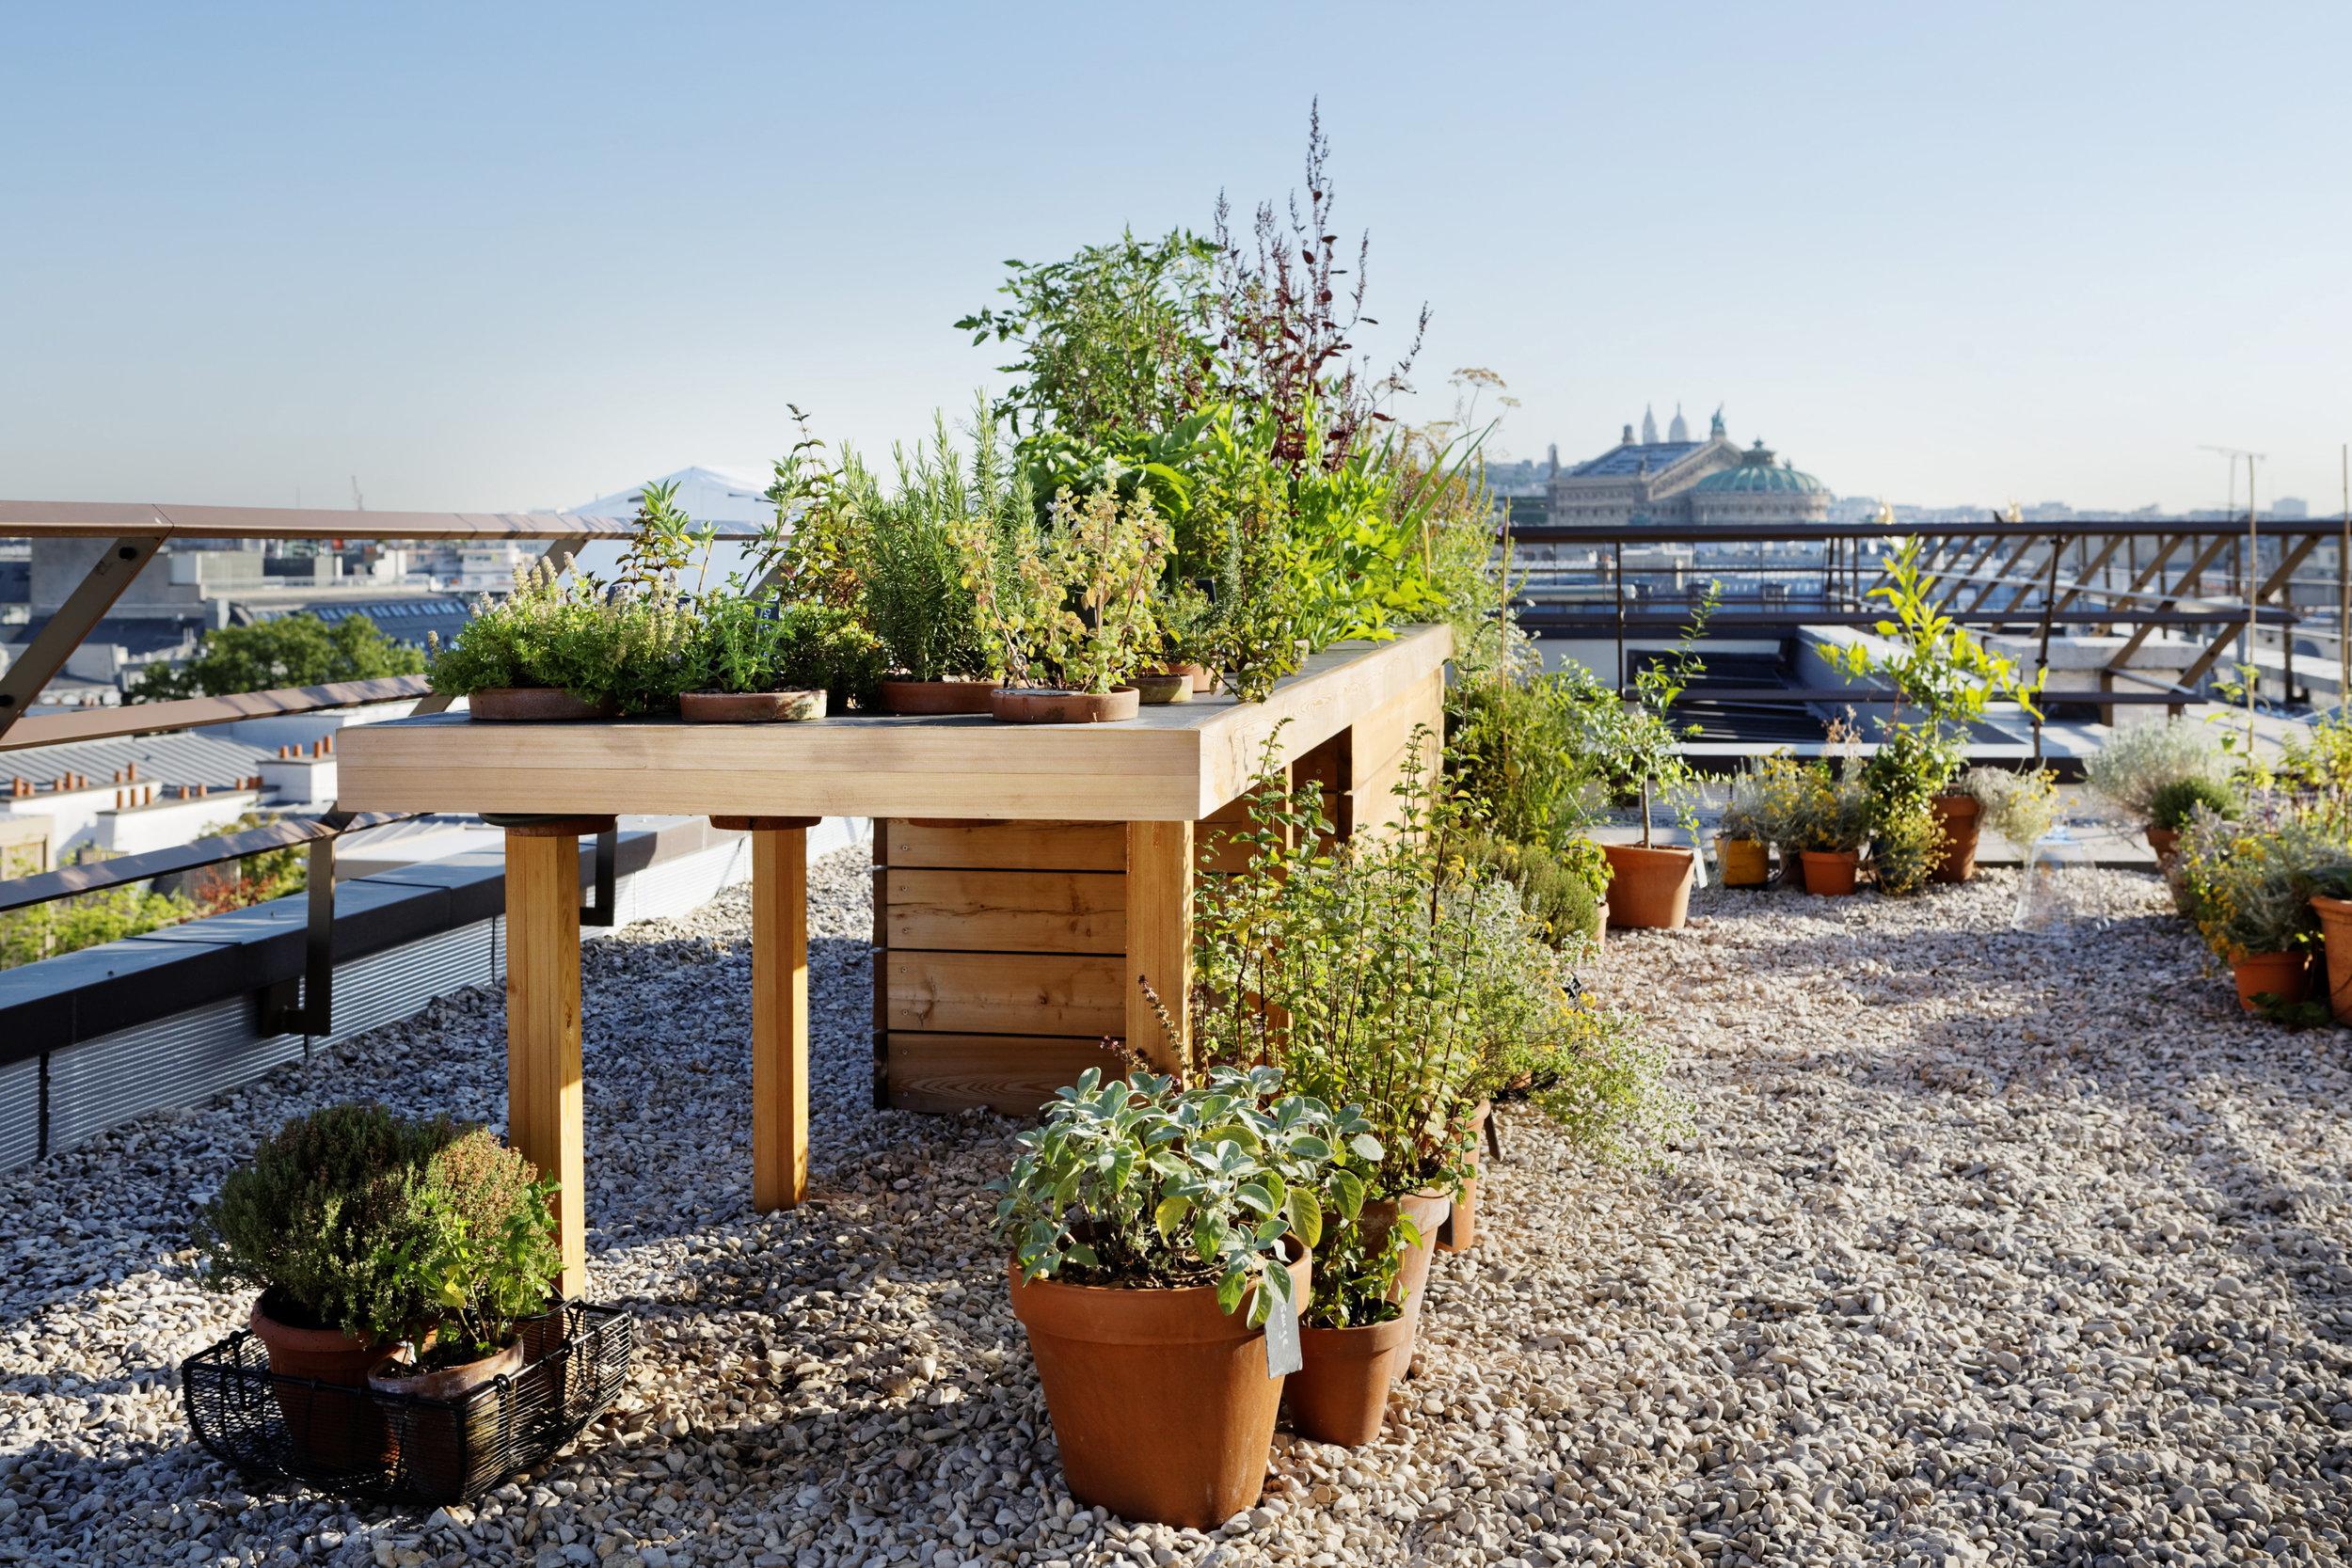 hotel_mandarin_oriental_paris_terraces_gardens_vegetable_garden_thierry_marx_christophe_gautrand_landscape_outdoor_designer_2.jpg